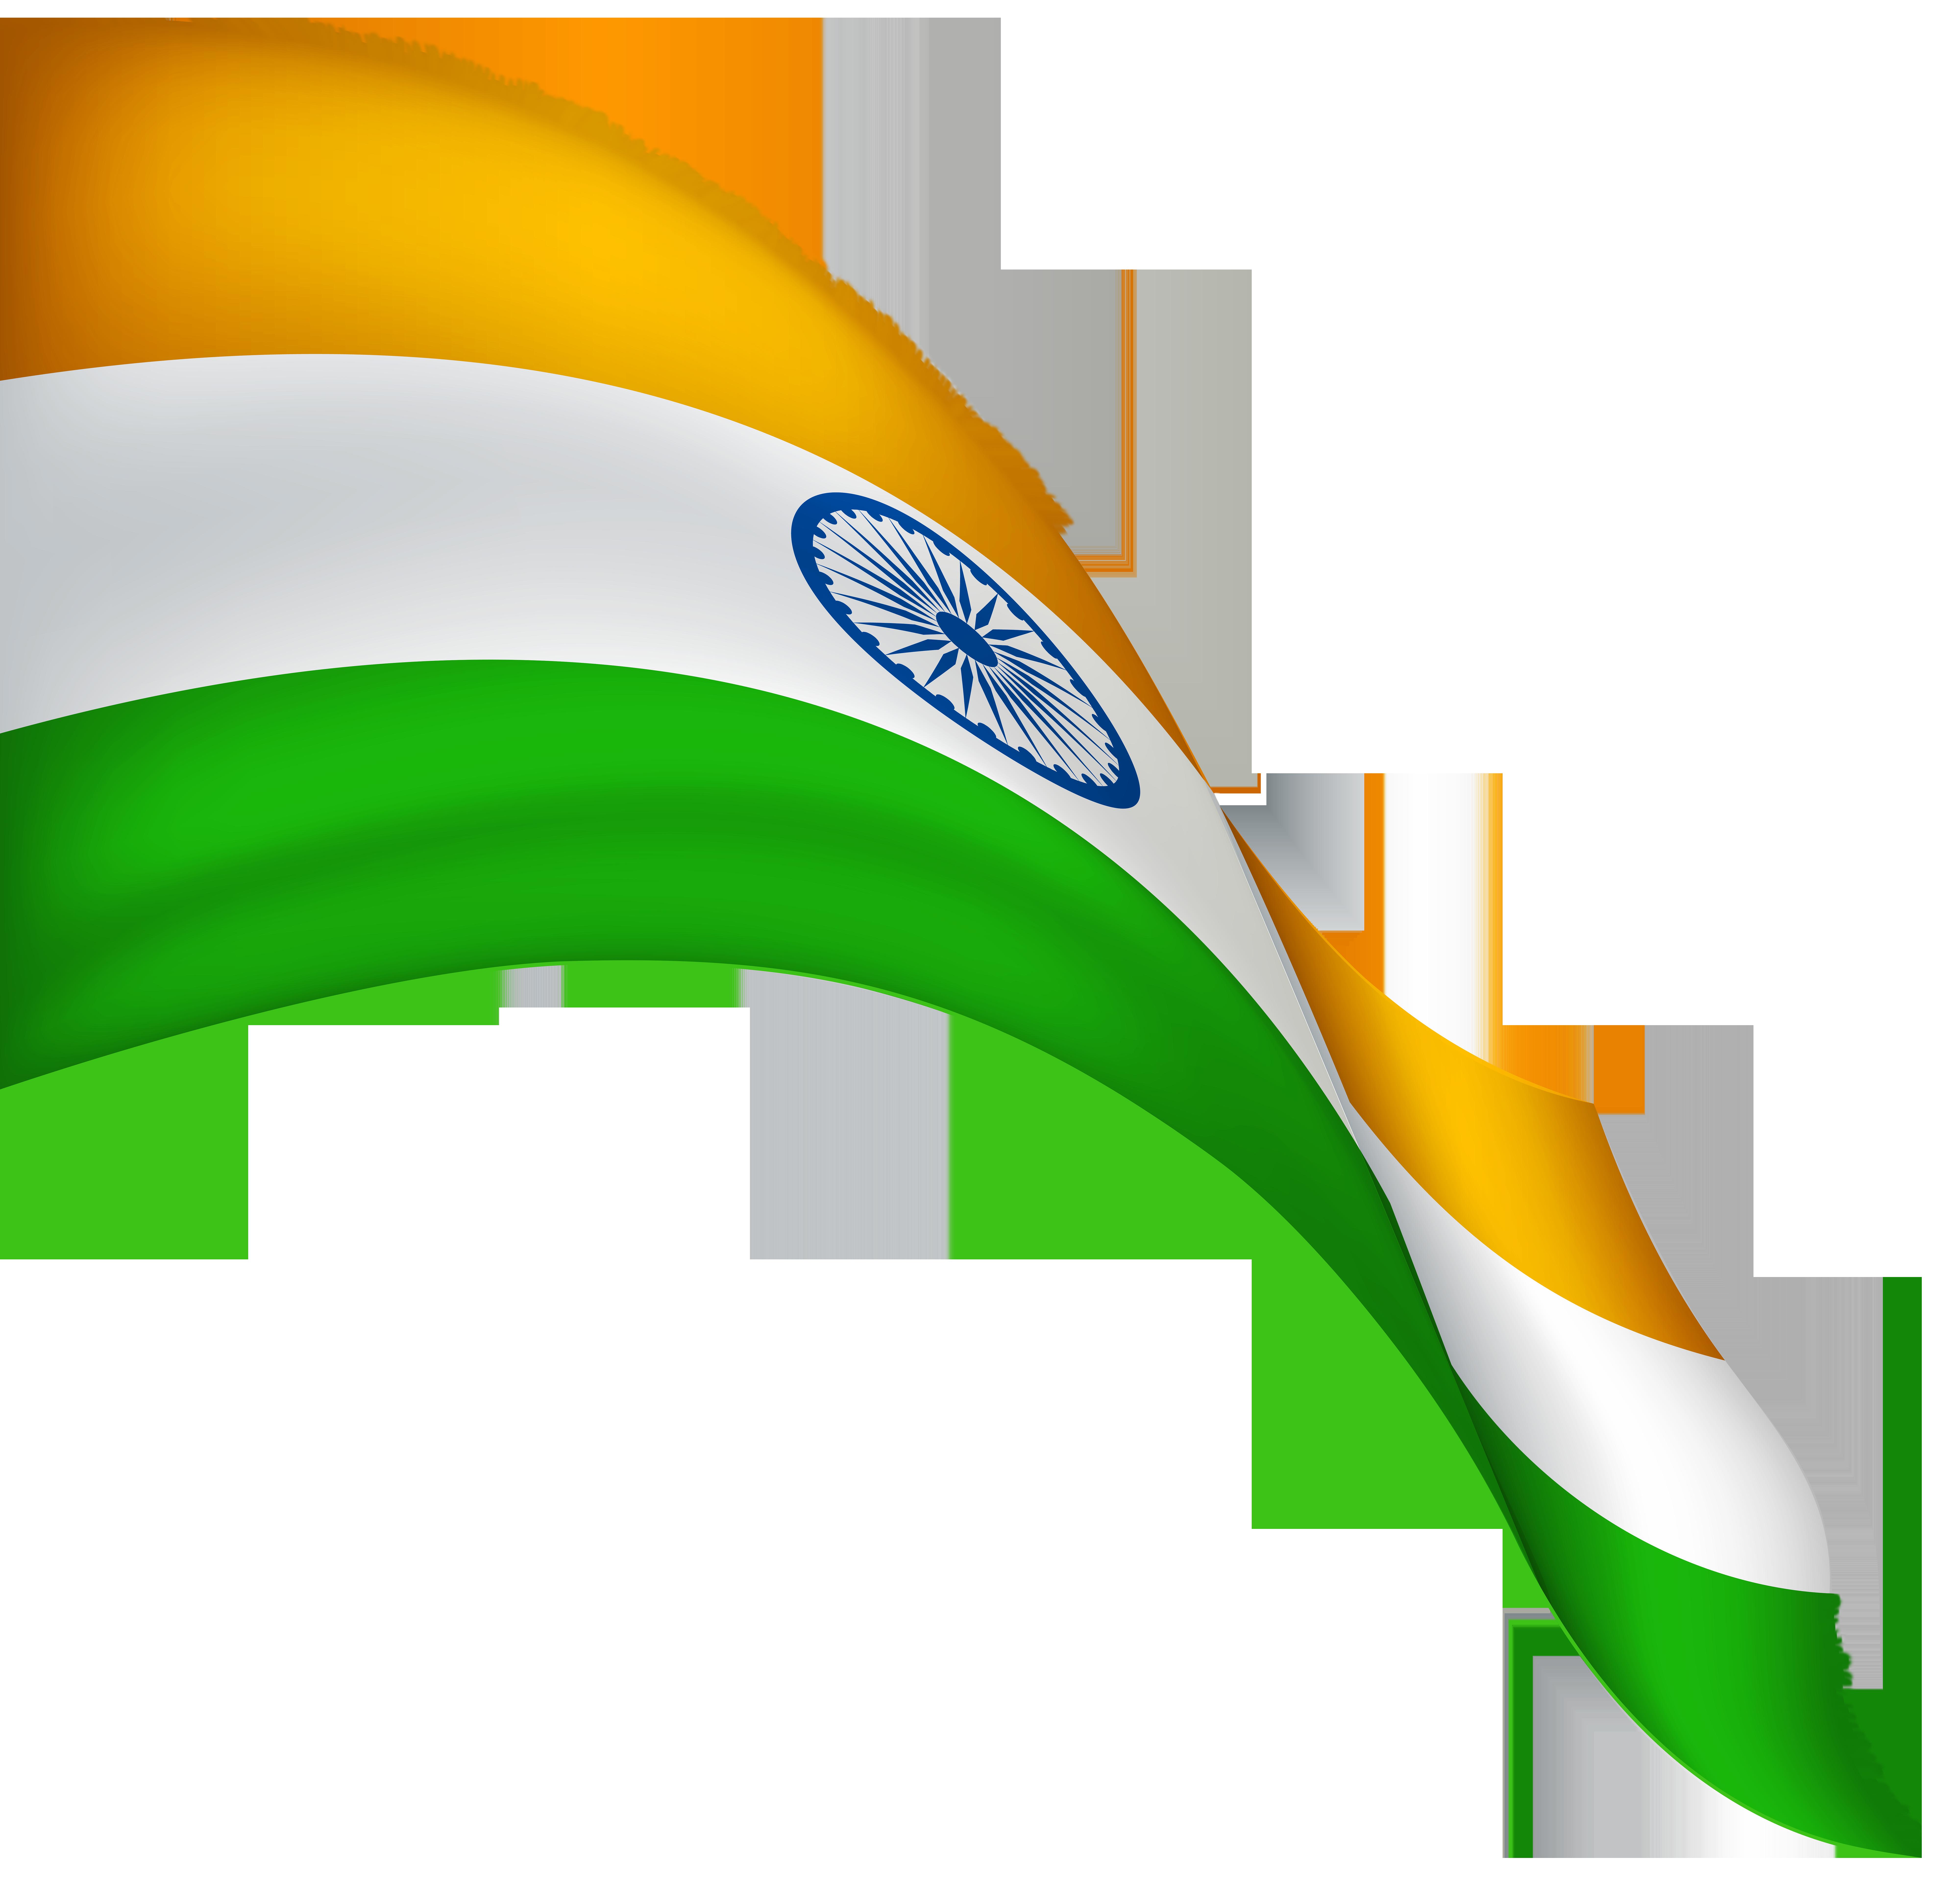 8000x7673 India Waving Flag Transparent Clip Art Imageu200b Gallery